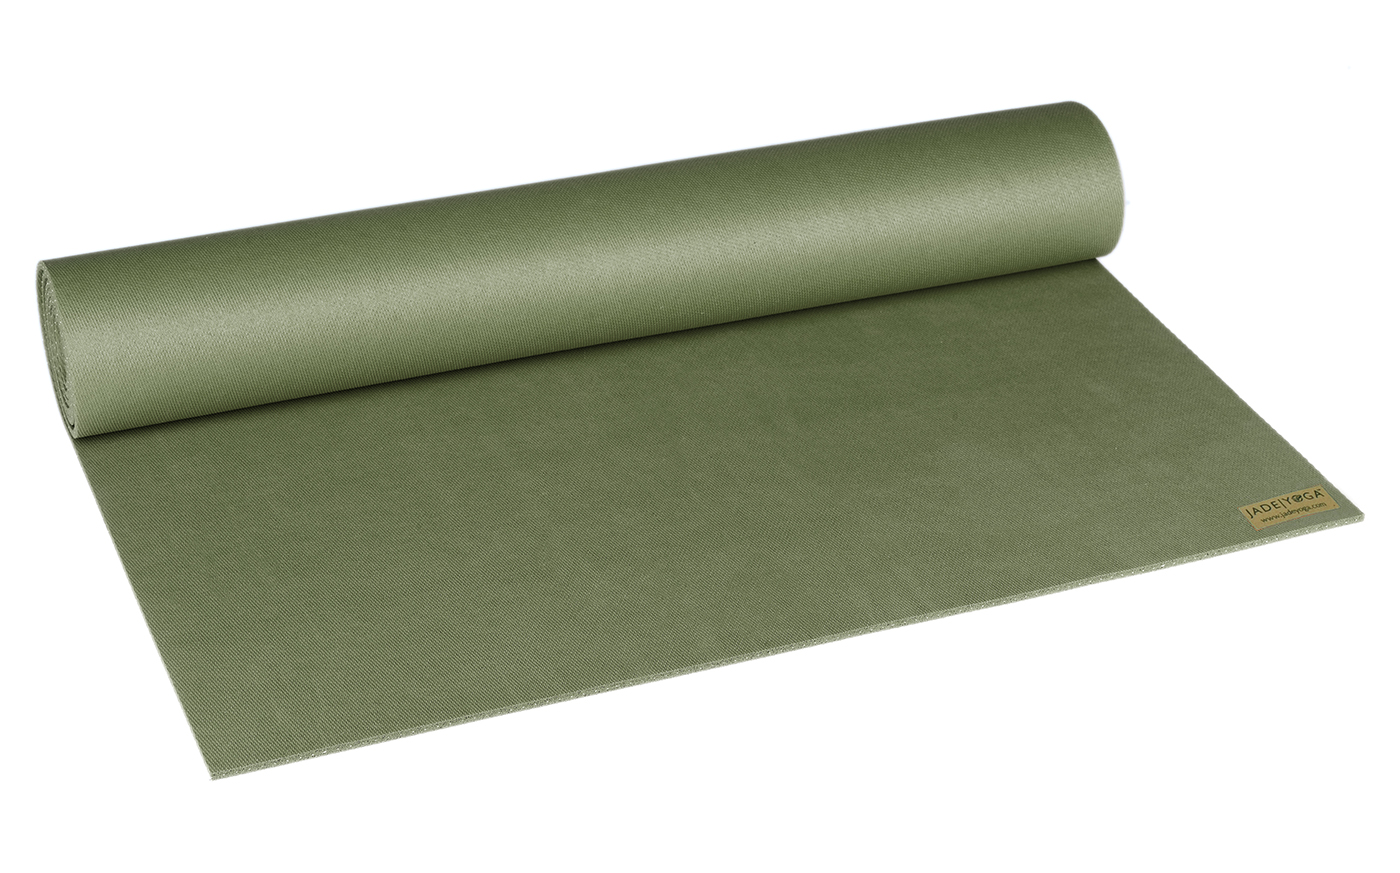 Jade Harmony 3/16'', 68'' (5mm, 173cm)